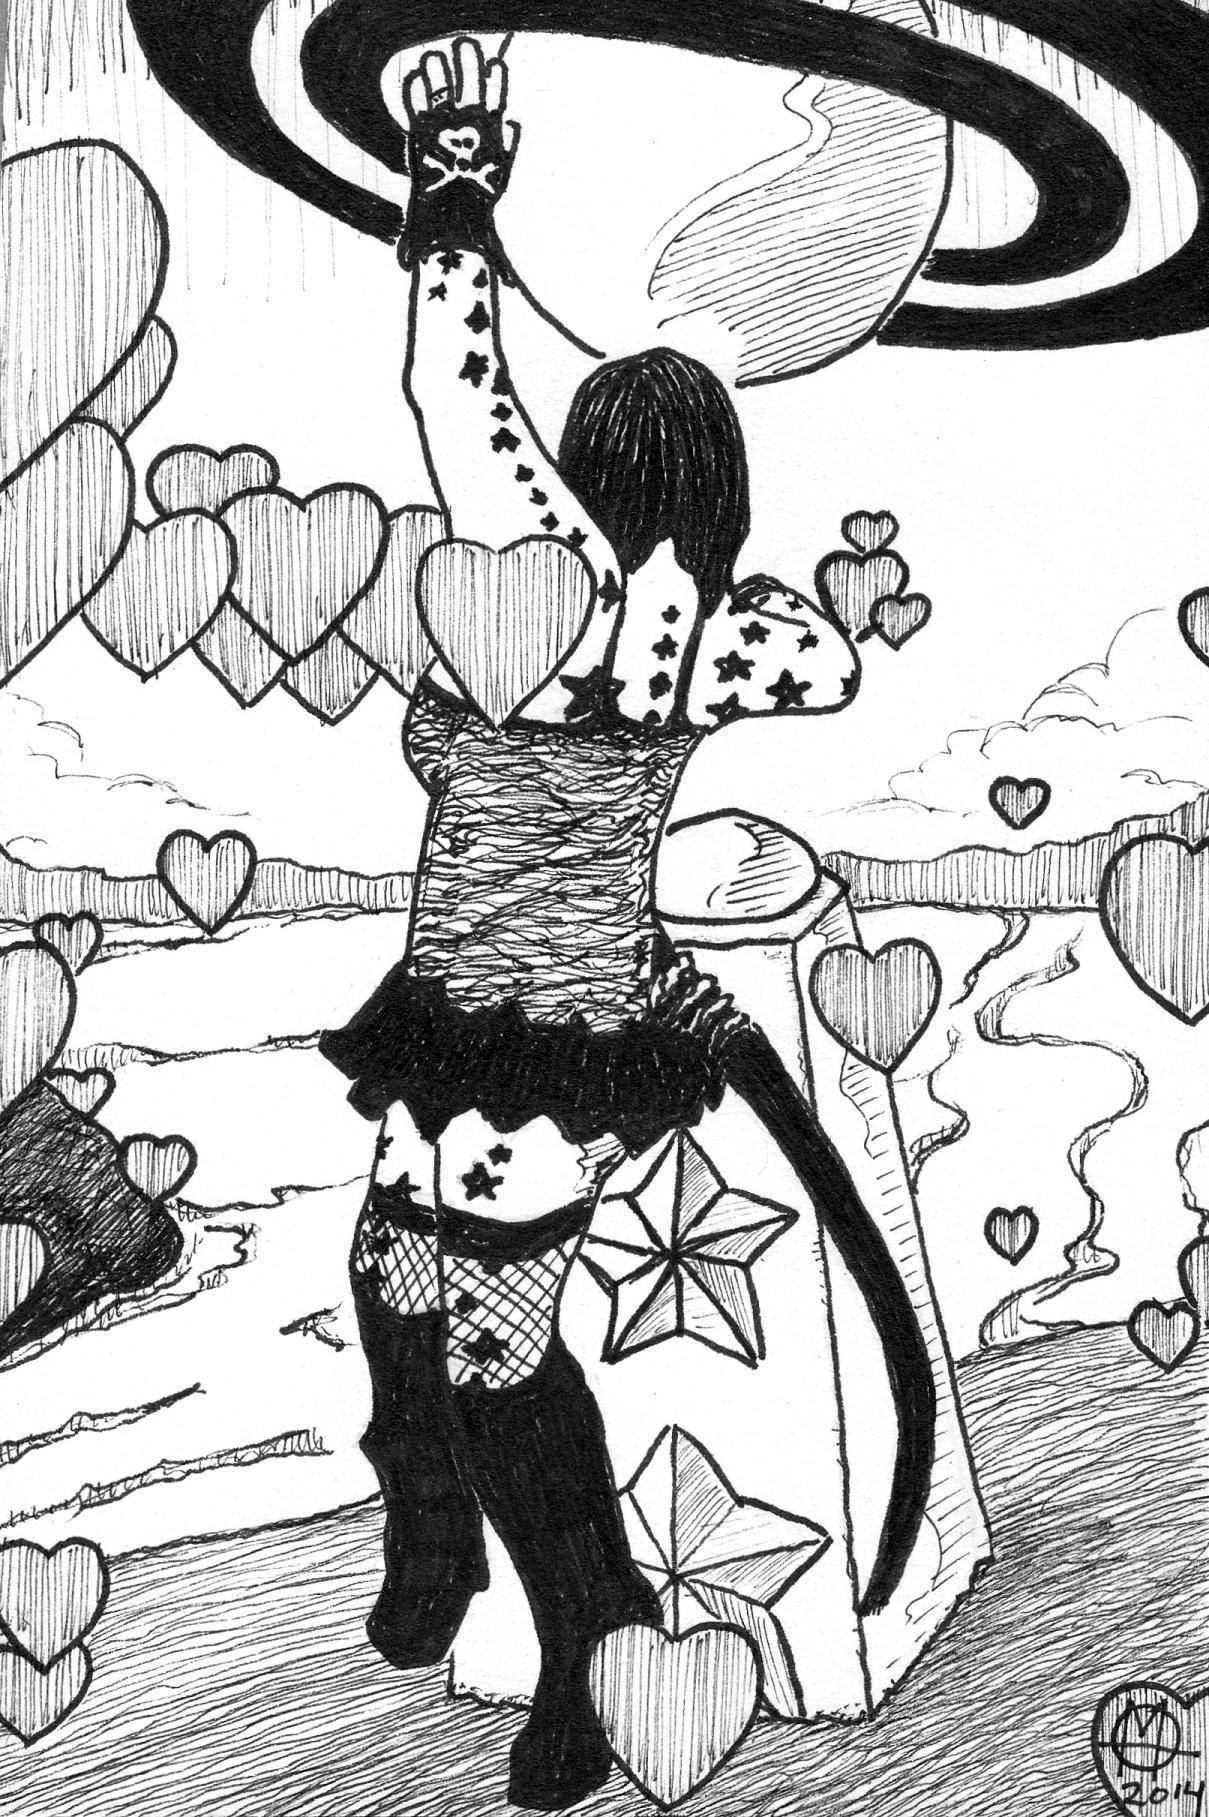 dancing girl ink drawing - Copy